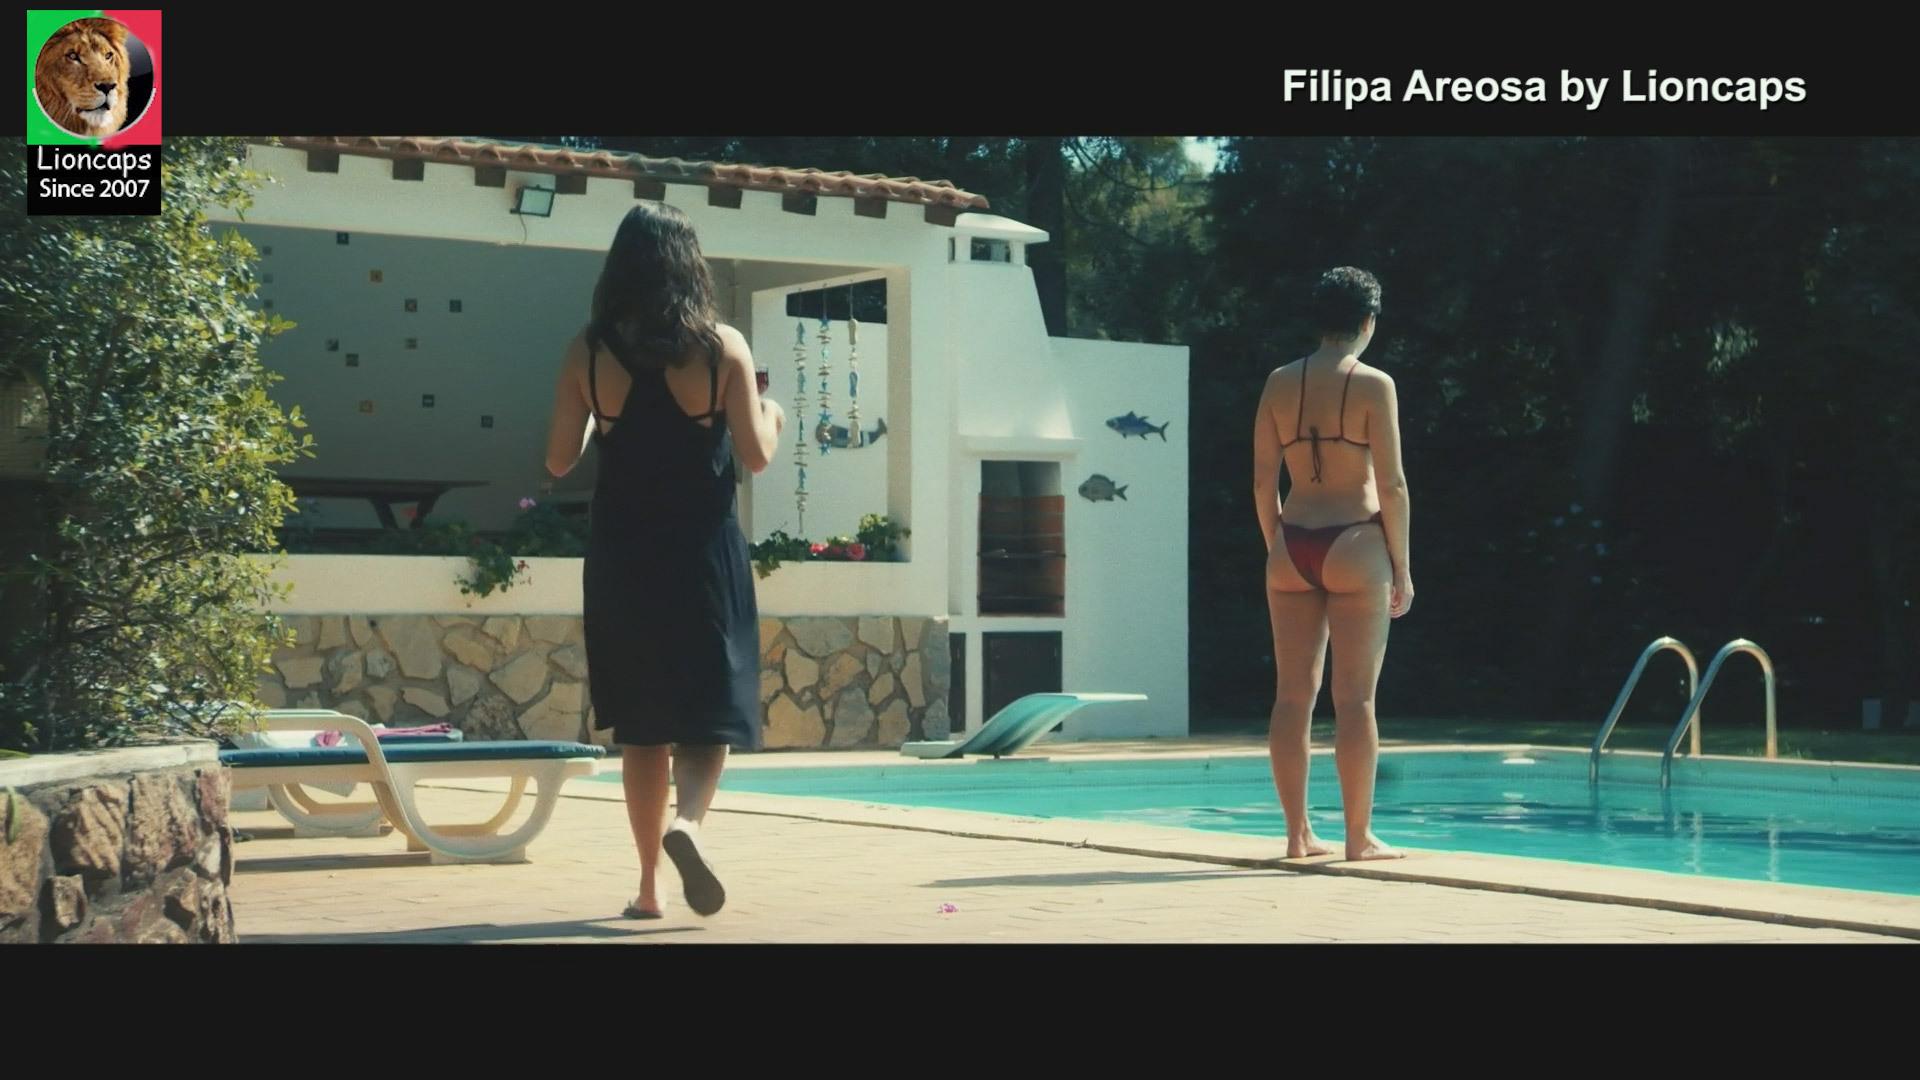 filipa_areosa (13).jpg